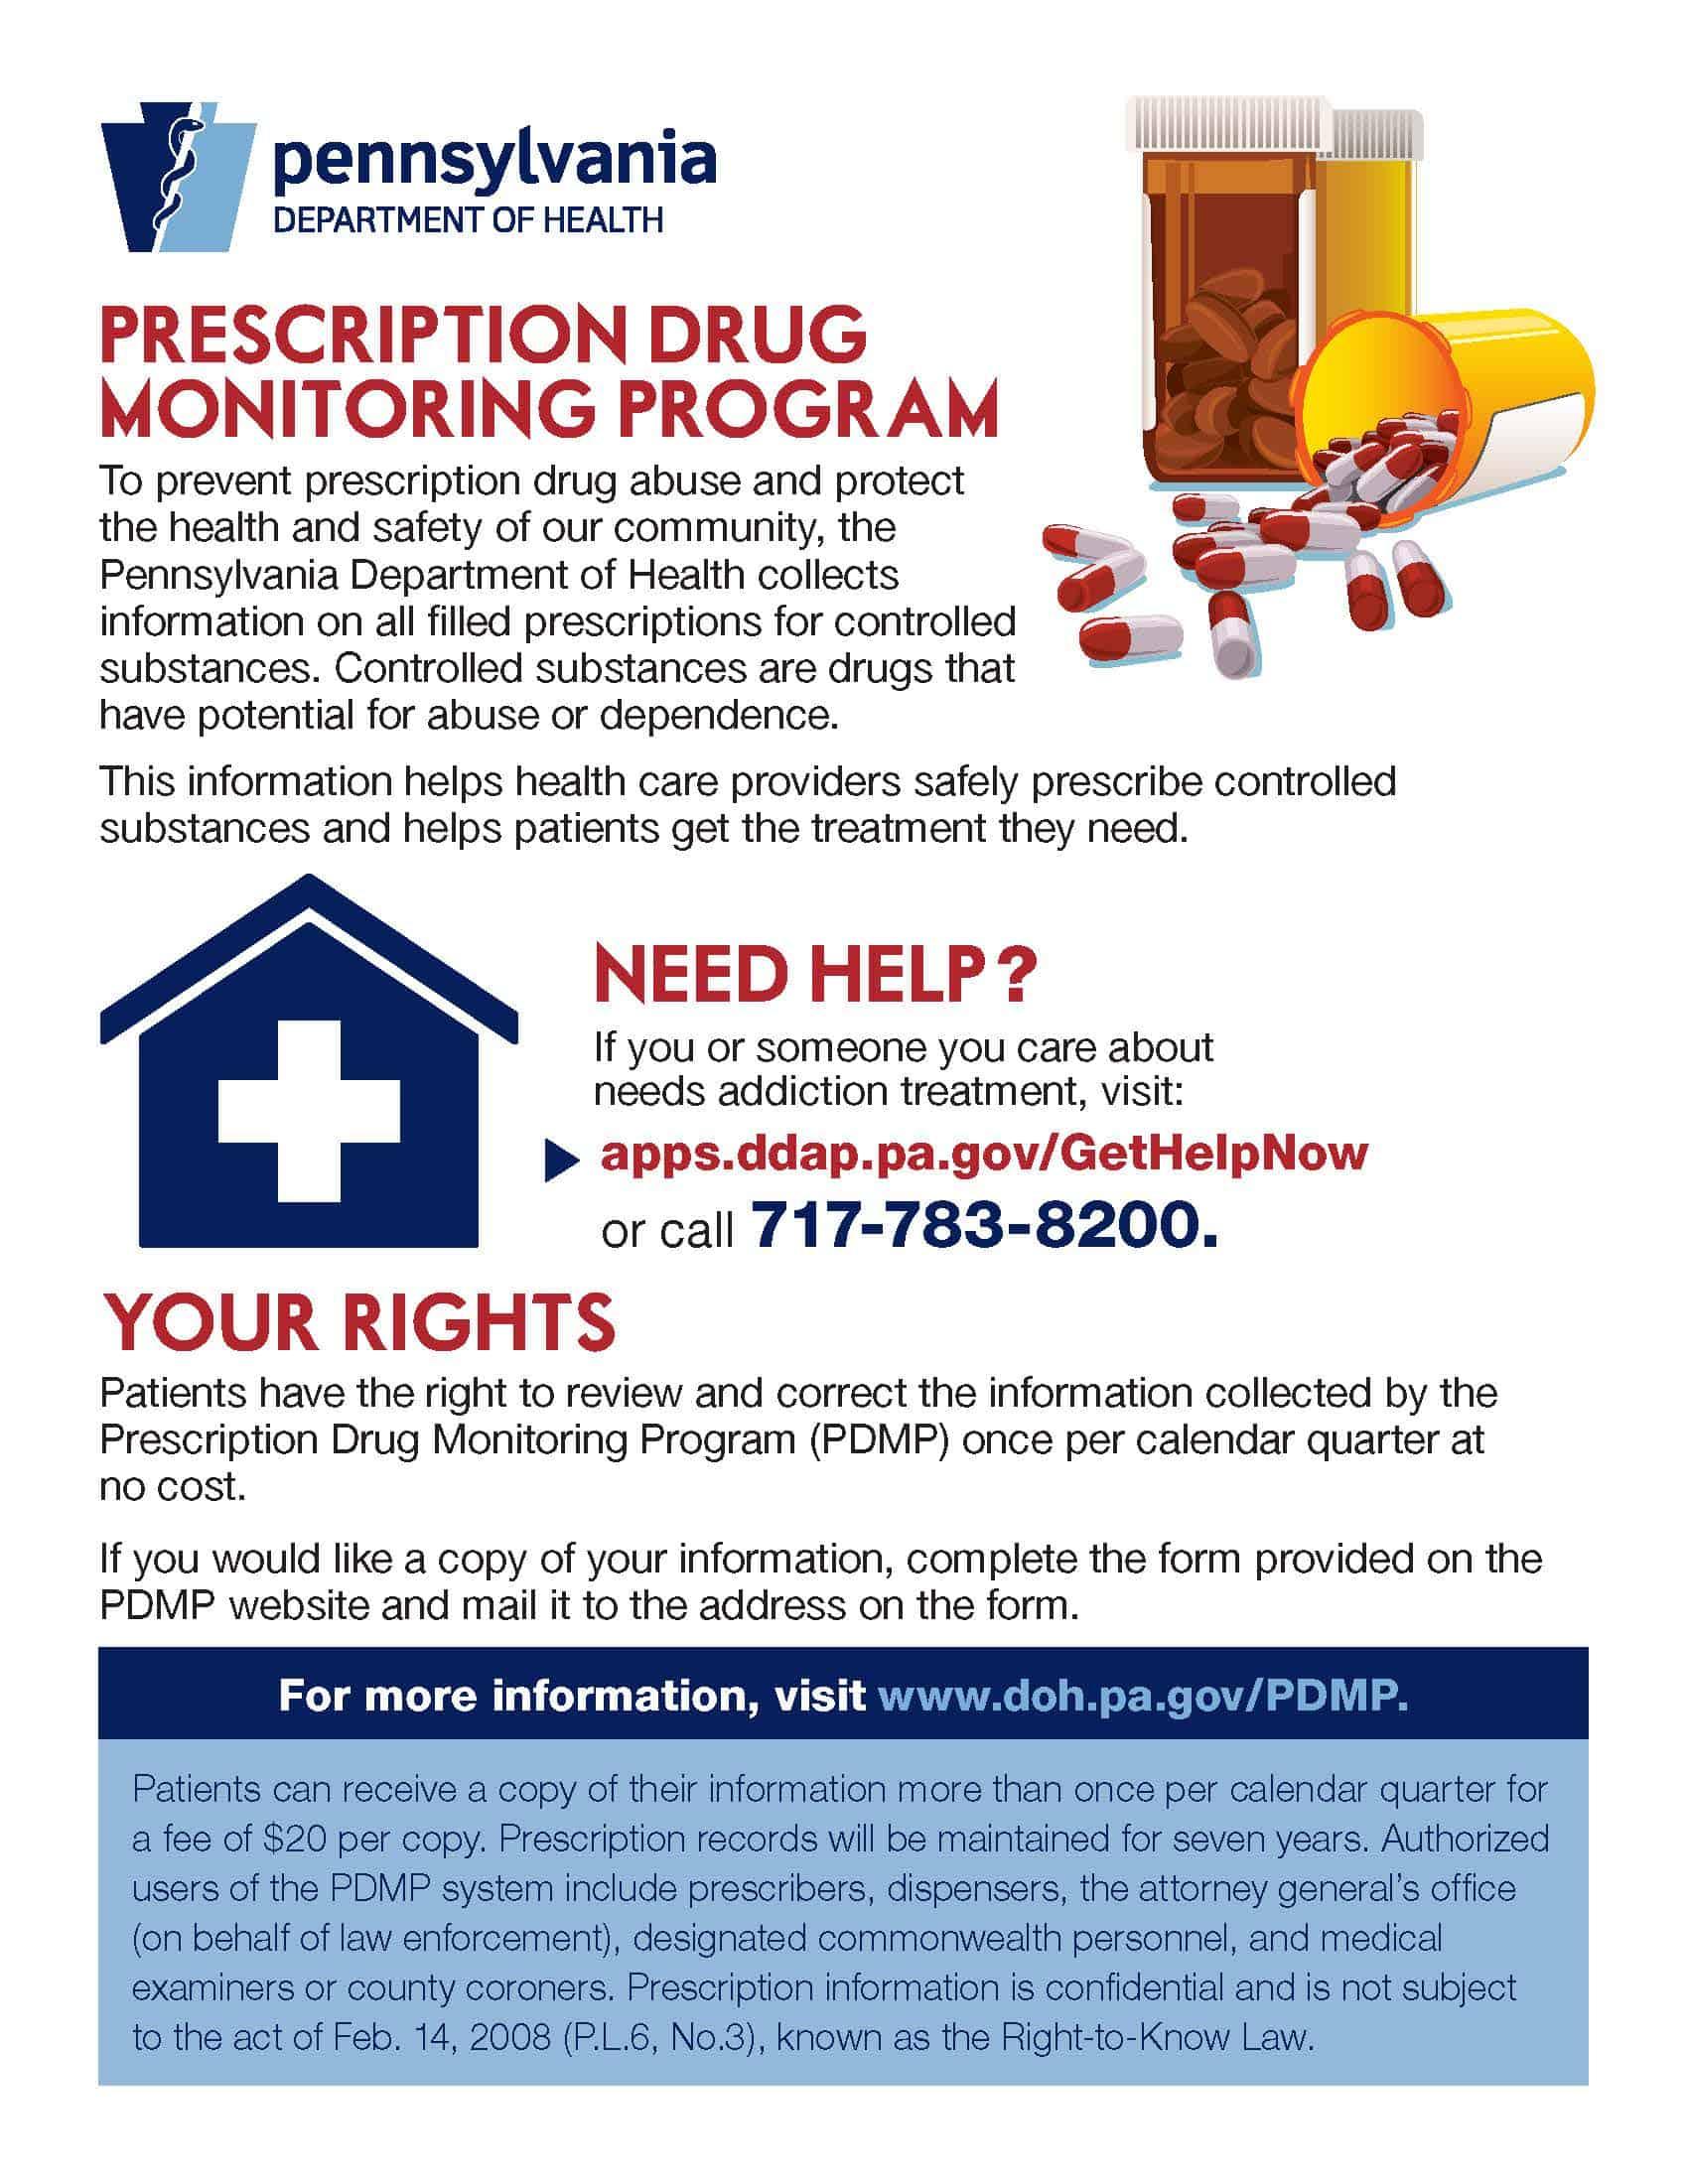 Prescribers